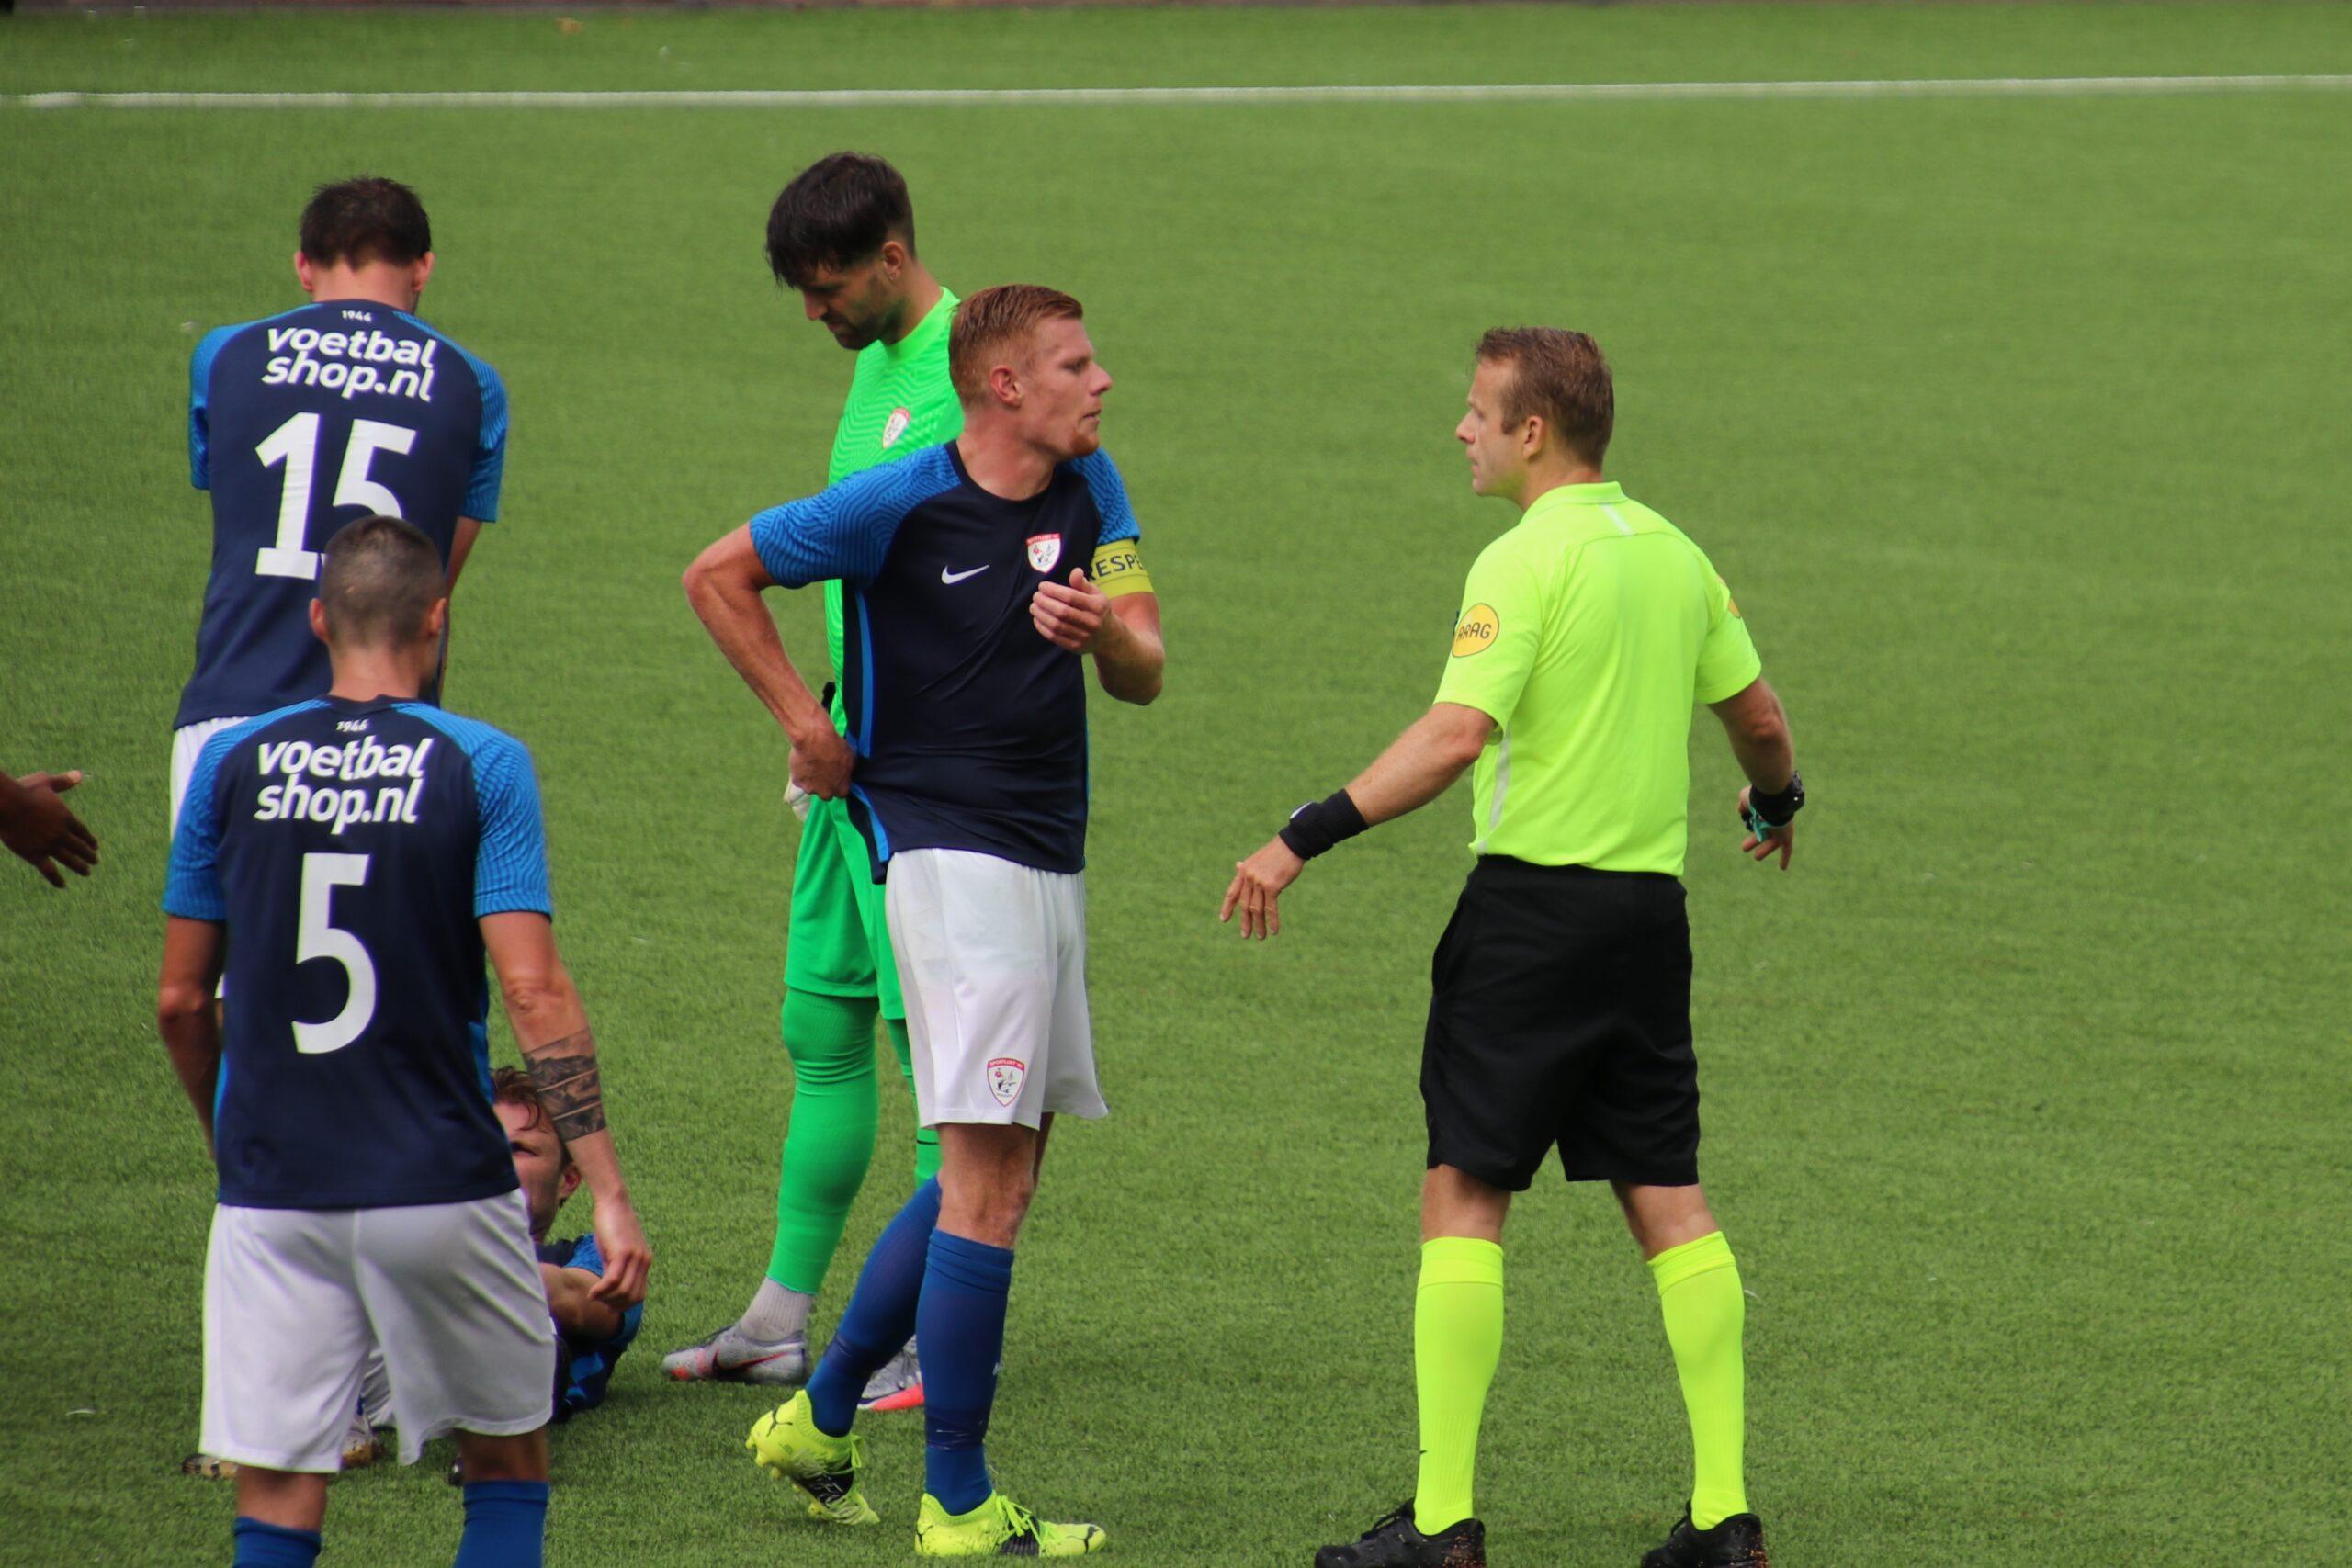 AFC- Sportlust 46 (oefen)_2021 07 31_0123